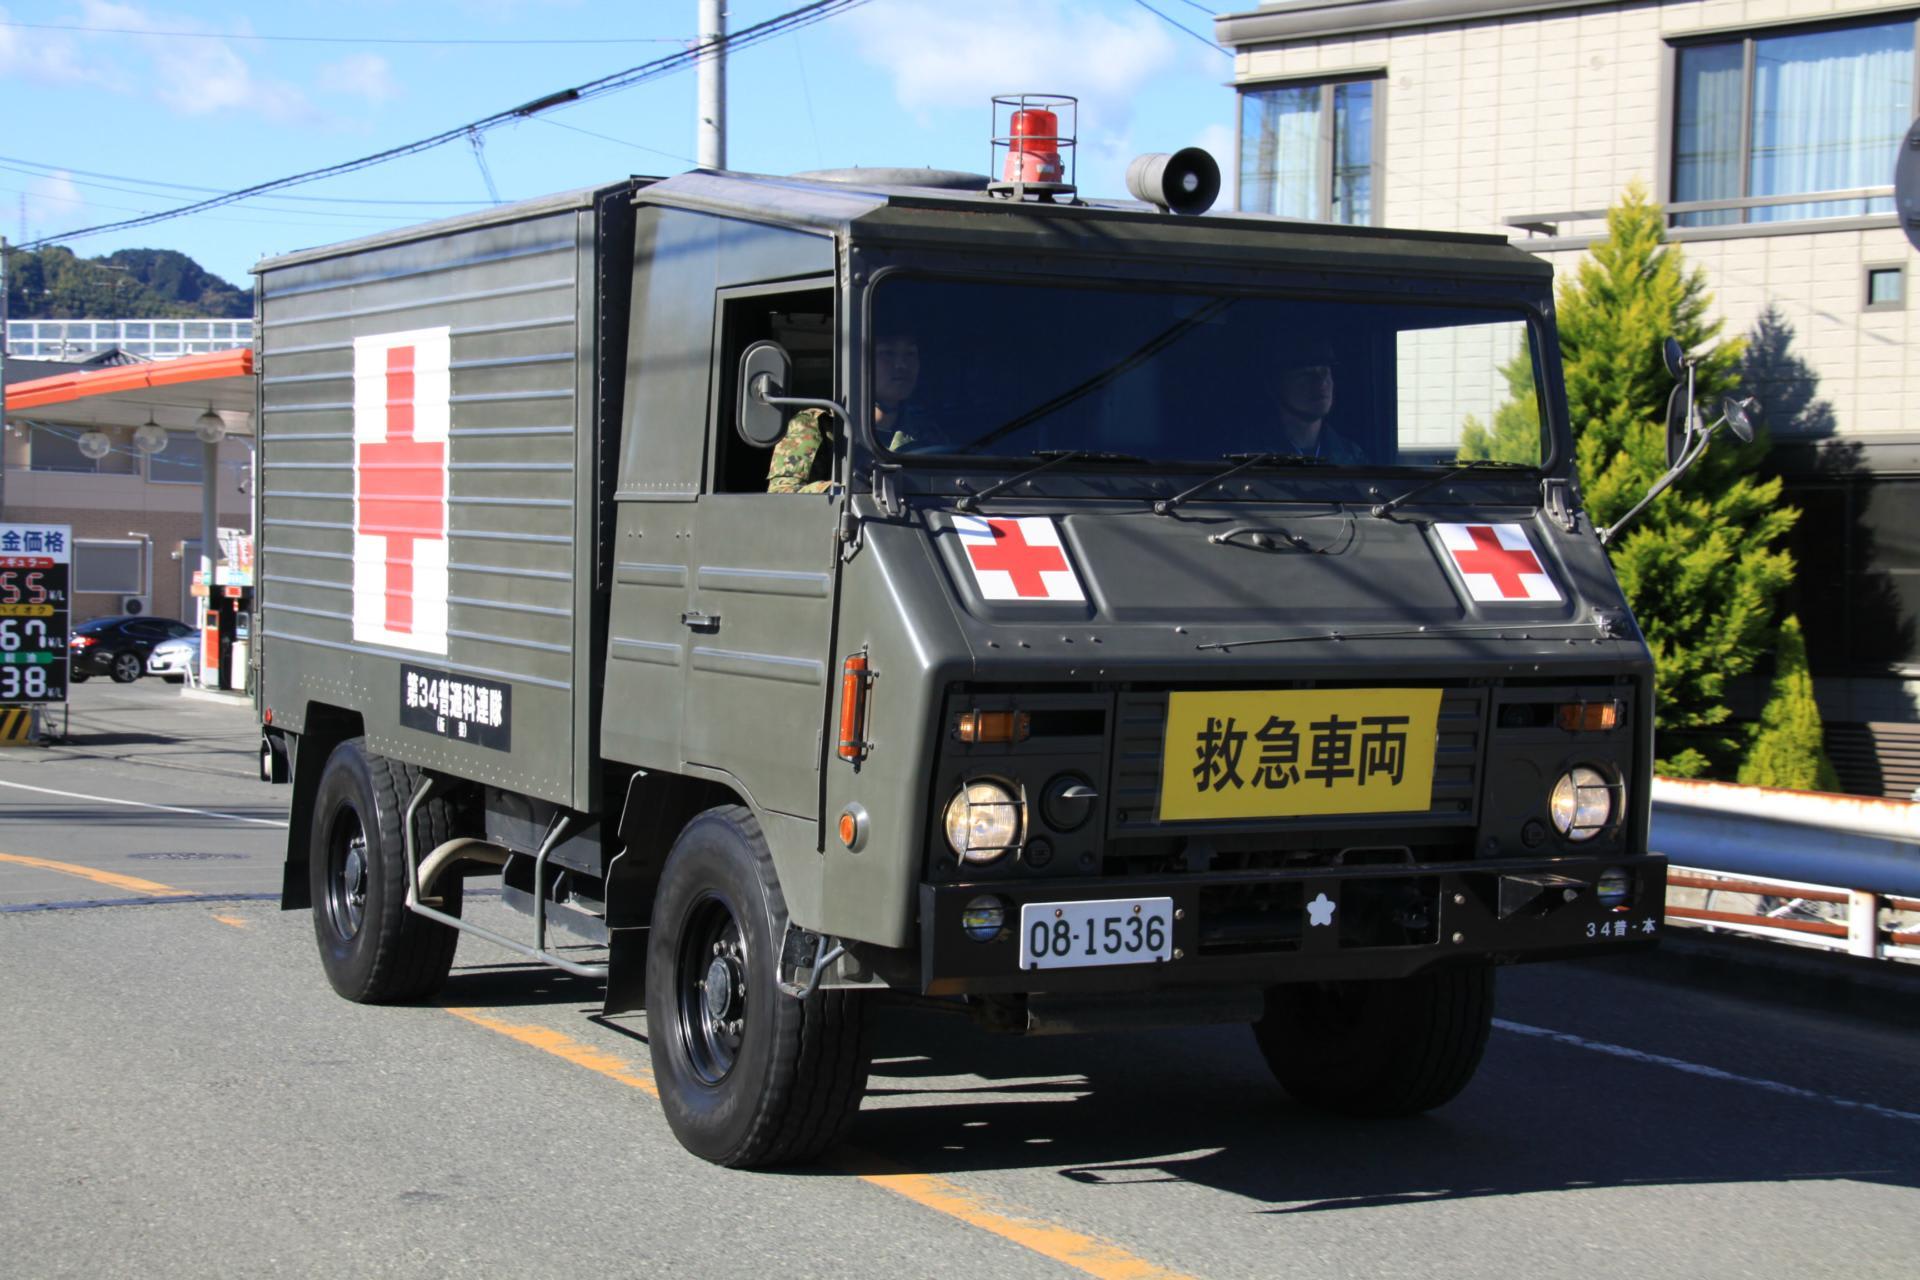 レスキュー車,救援車両,水陸両用車,乗り物,交通,自動車,特殊車両,救急車,消防車,